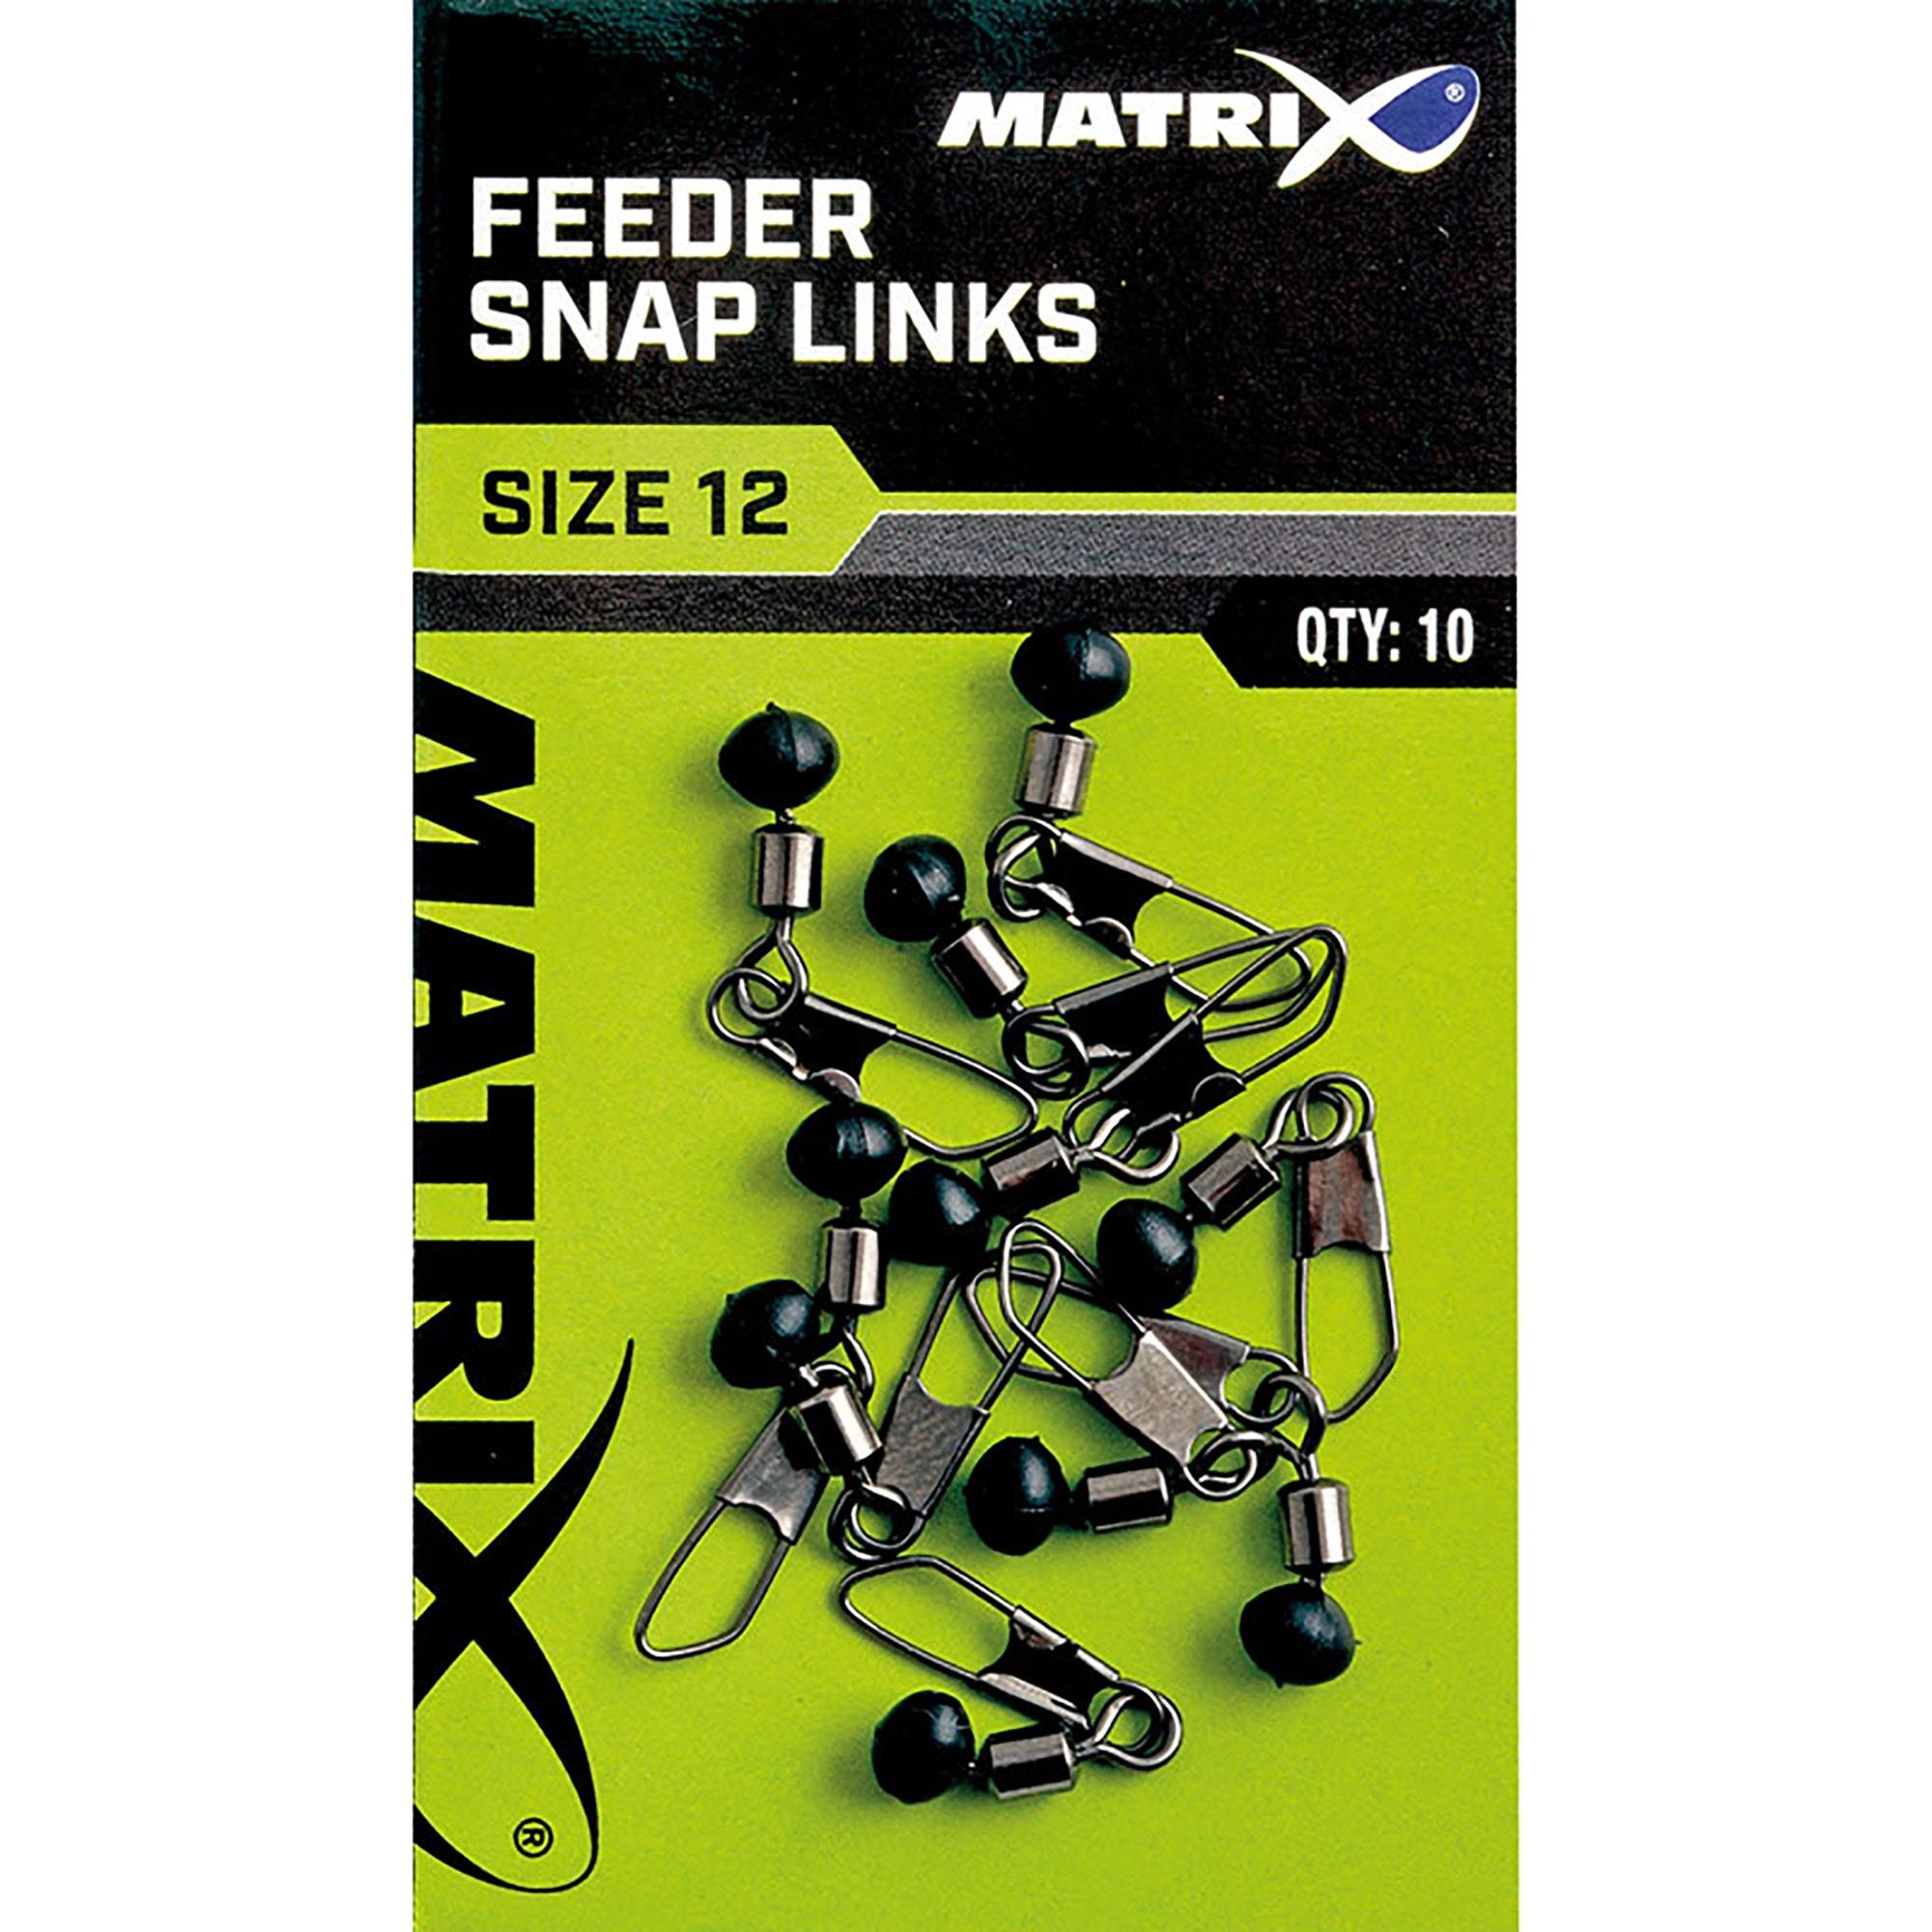 Attacco feeder Snap Links MATRIX